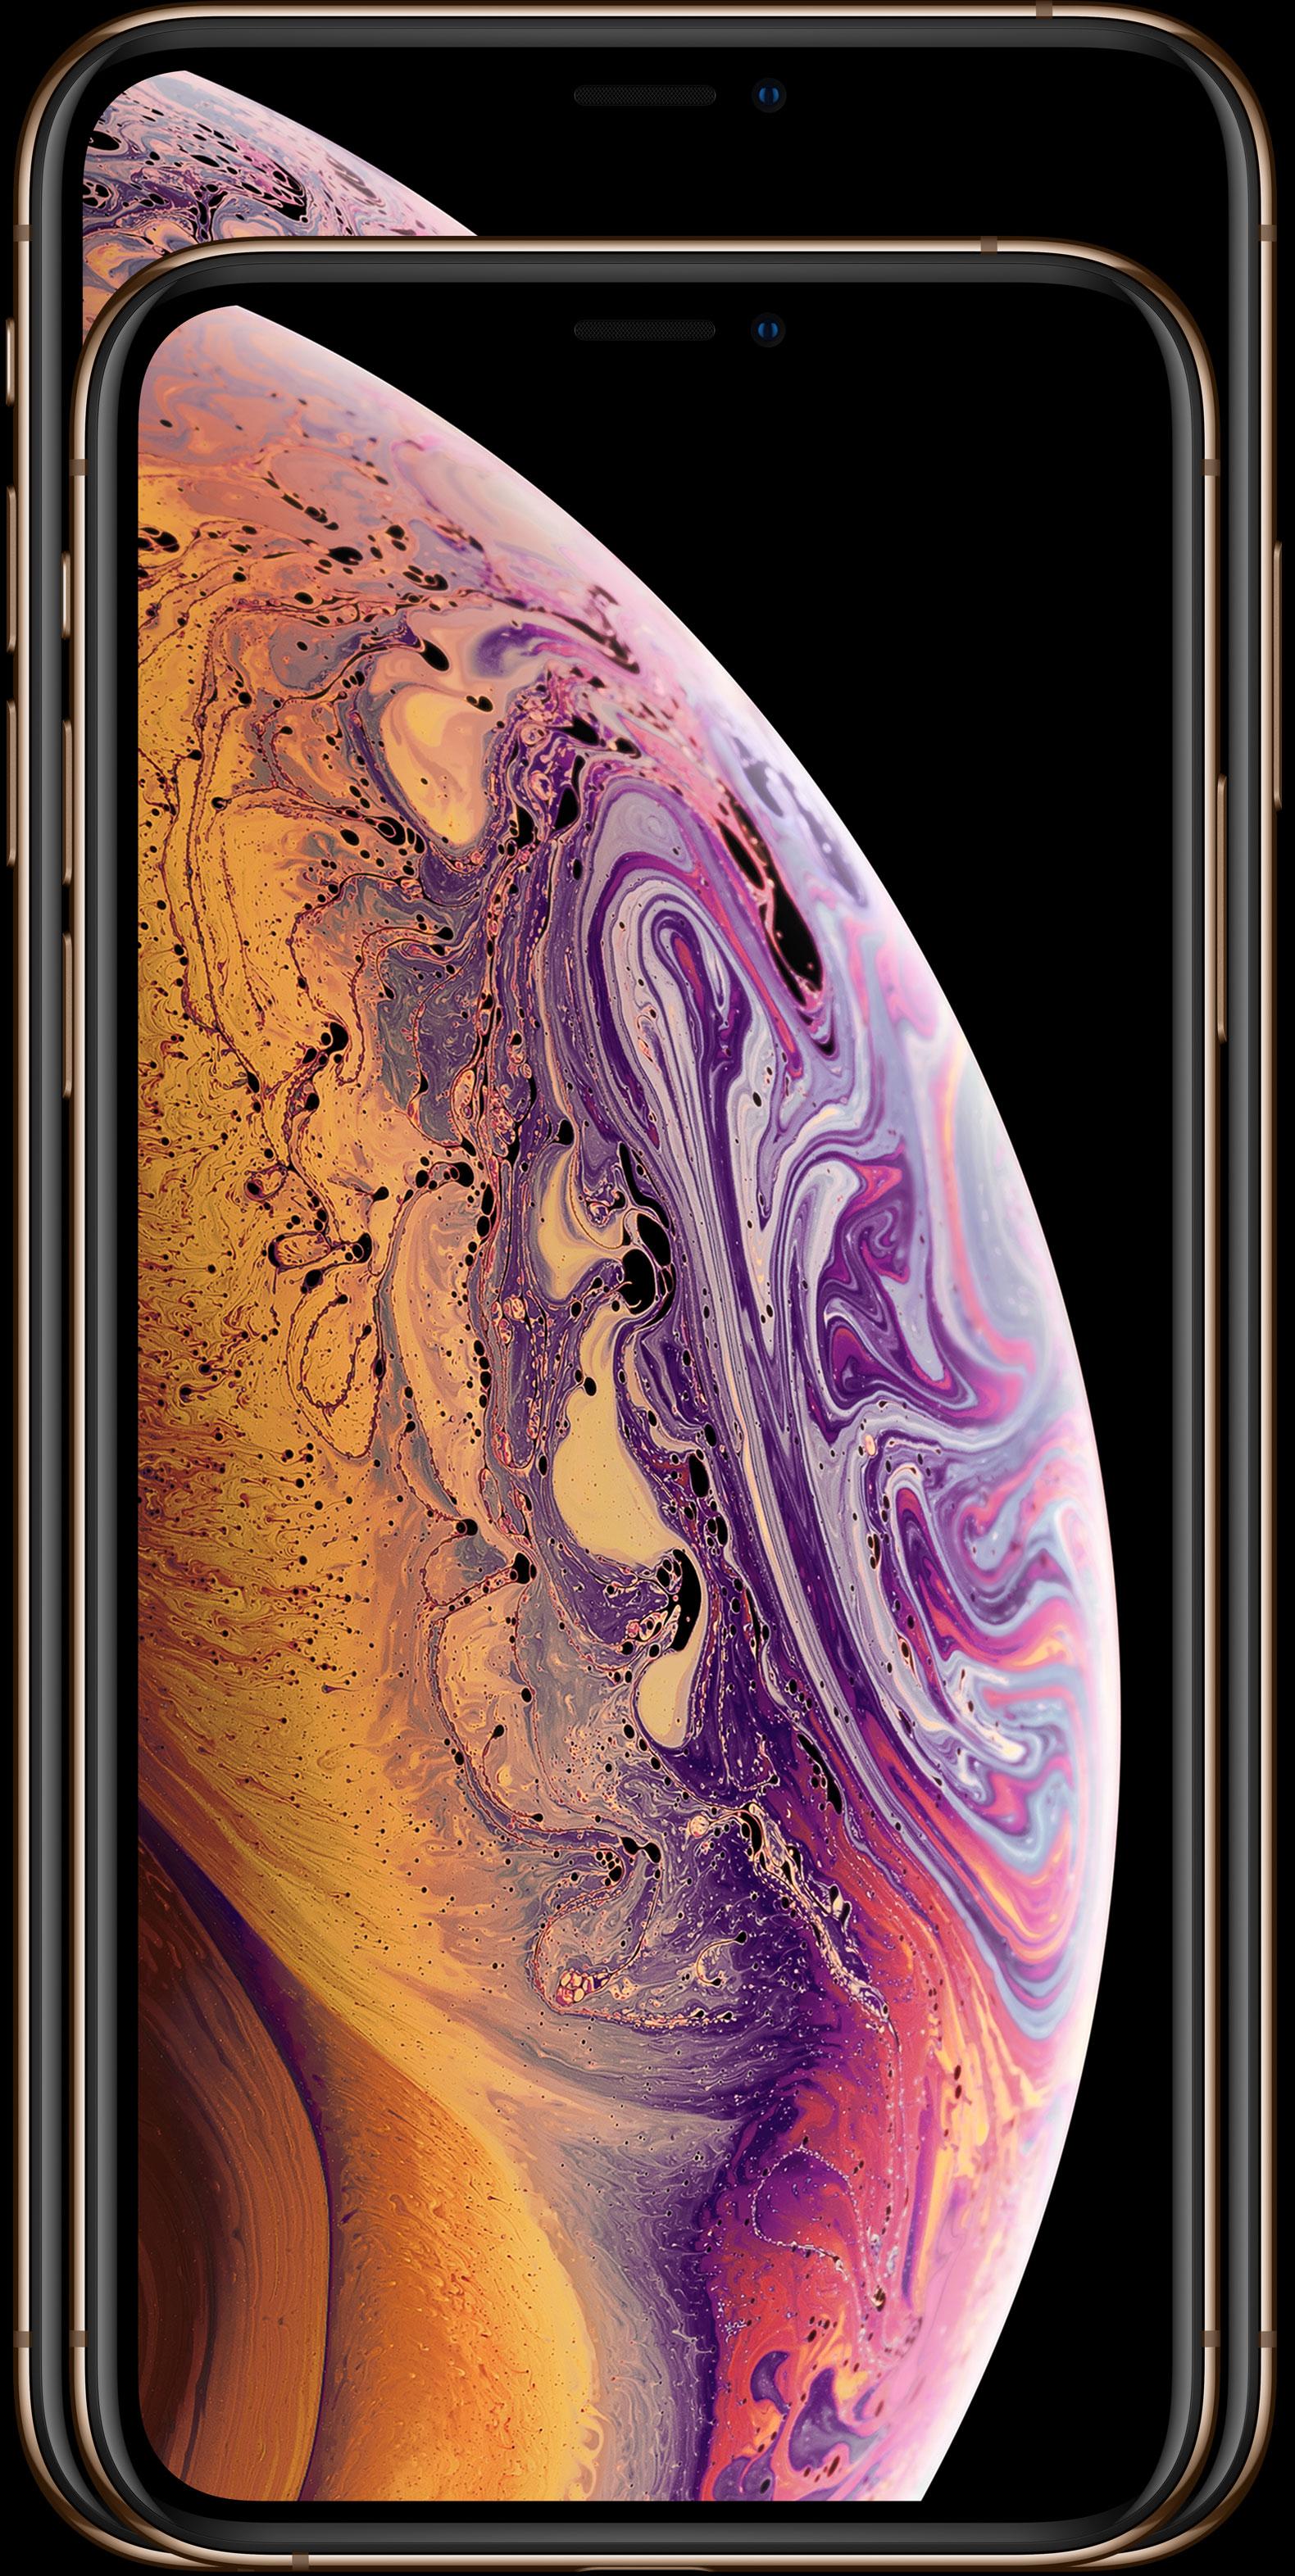 Apple iPhone XS Max CCT Communikation Uwe Gillner Augsburg Handy Smartphone Mobilfunk Internet Telekom Vodafone o2 Mobilcom Debitel Mnet Service Update